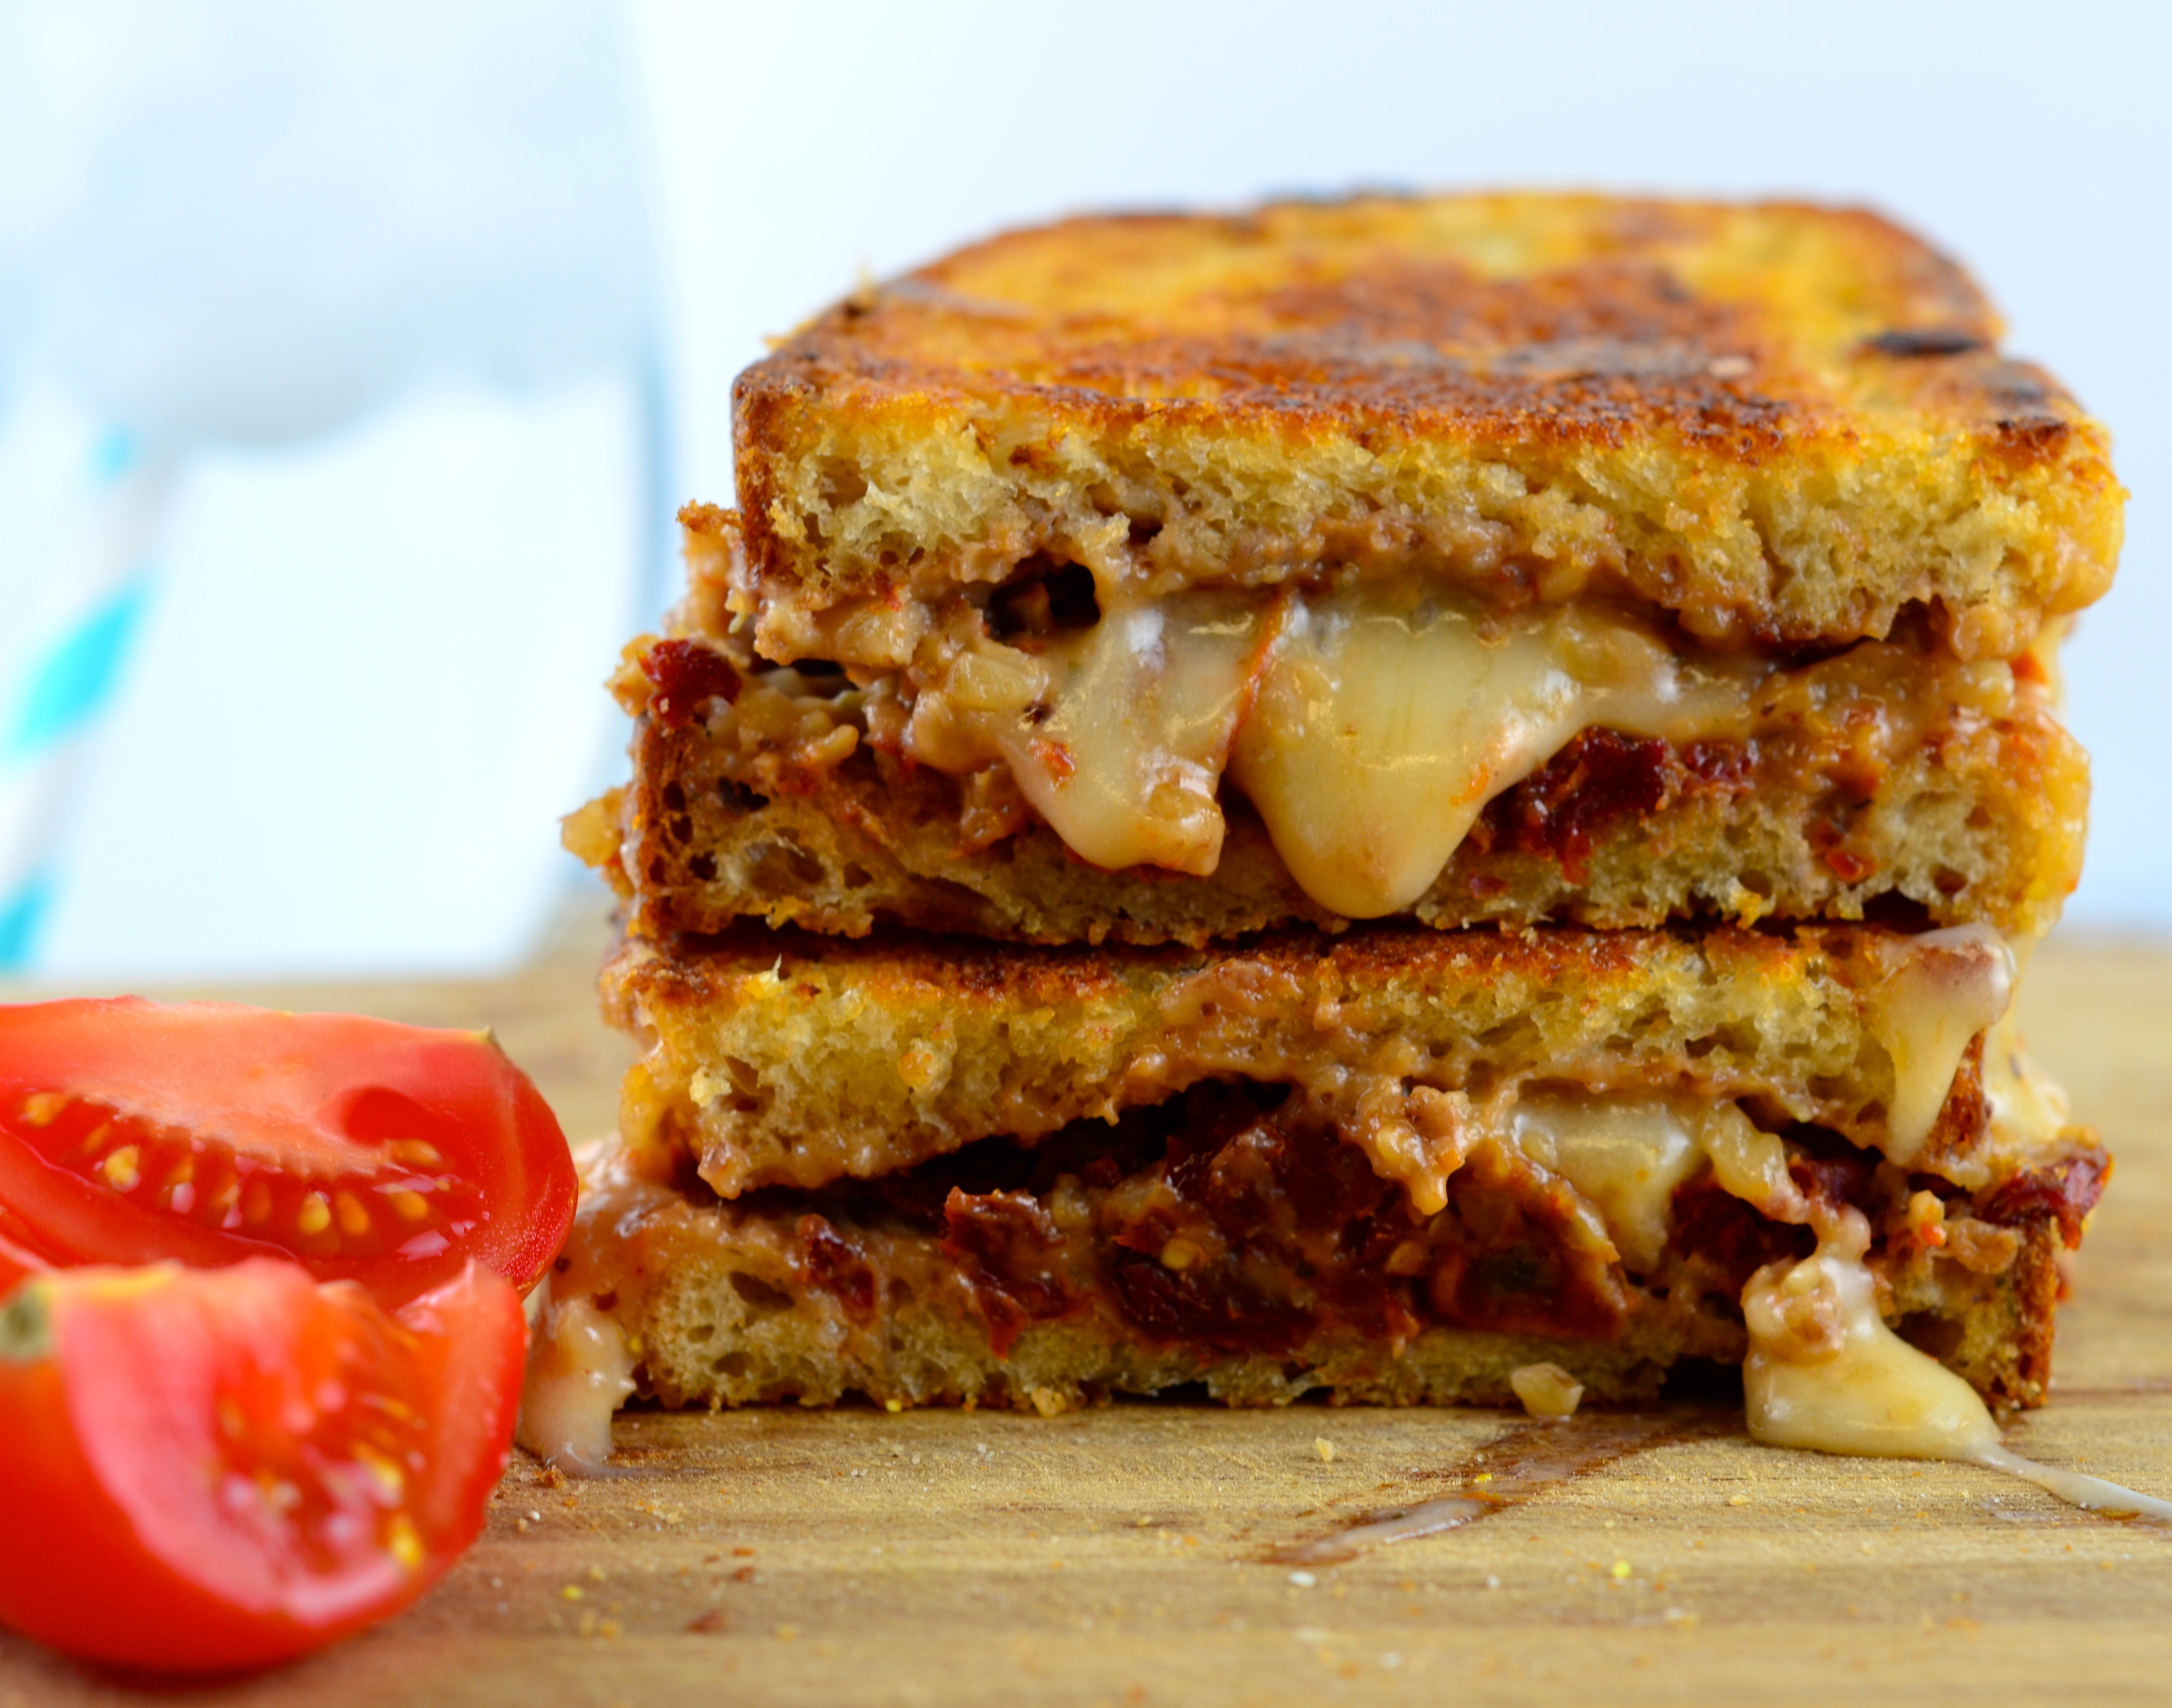 Vegan Walnut, Sun Dried Tomato & Basil Grilled Cheese Sandwich